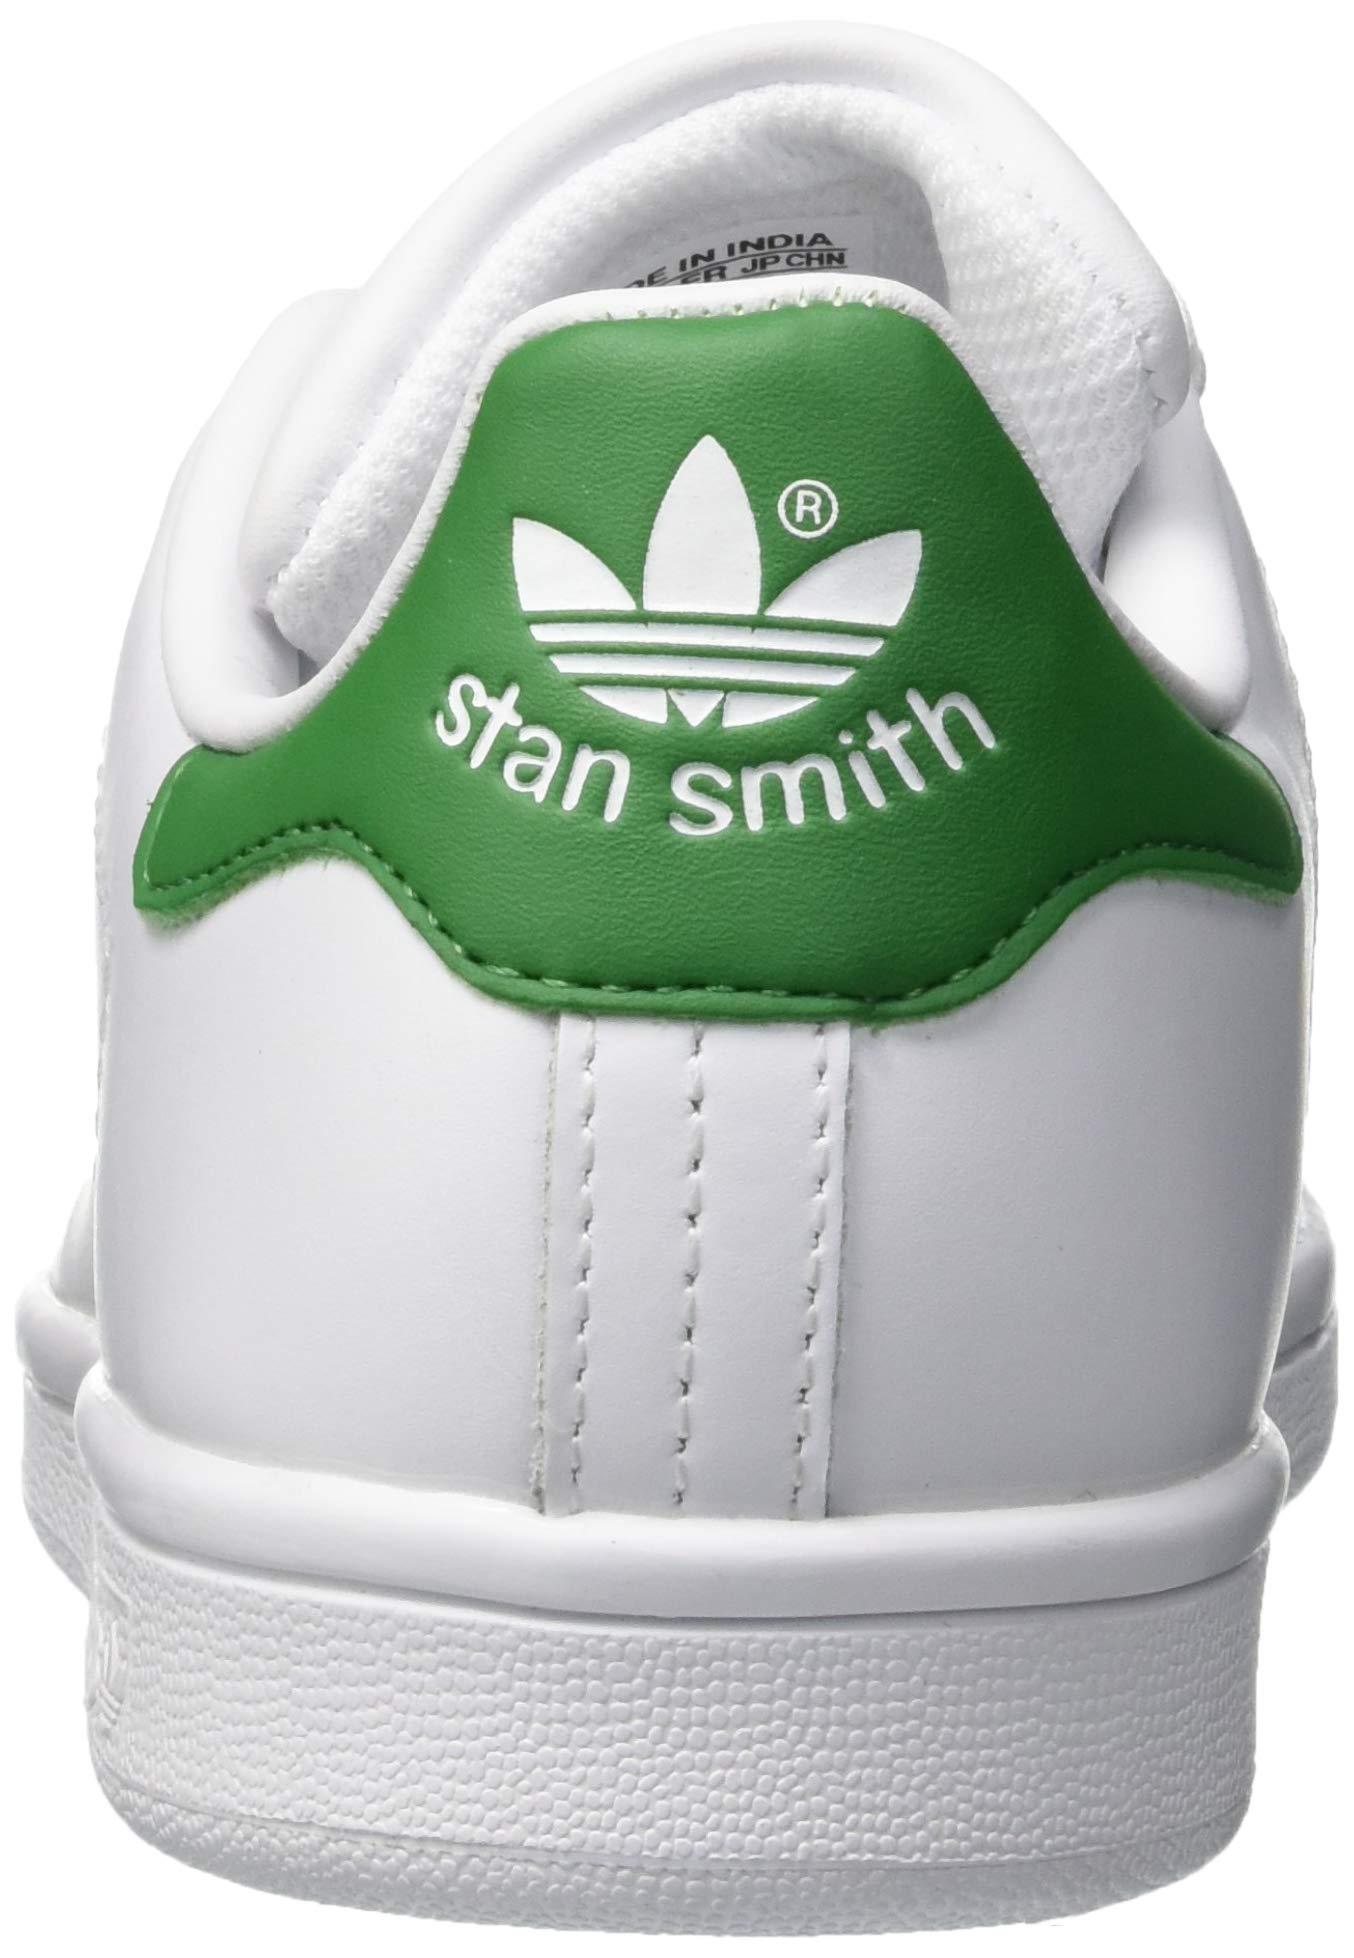 adidas Originals Stan Smith, Sneakers Unisex – Adulto 2 spesavip